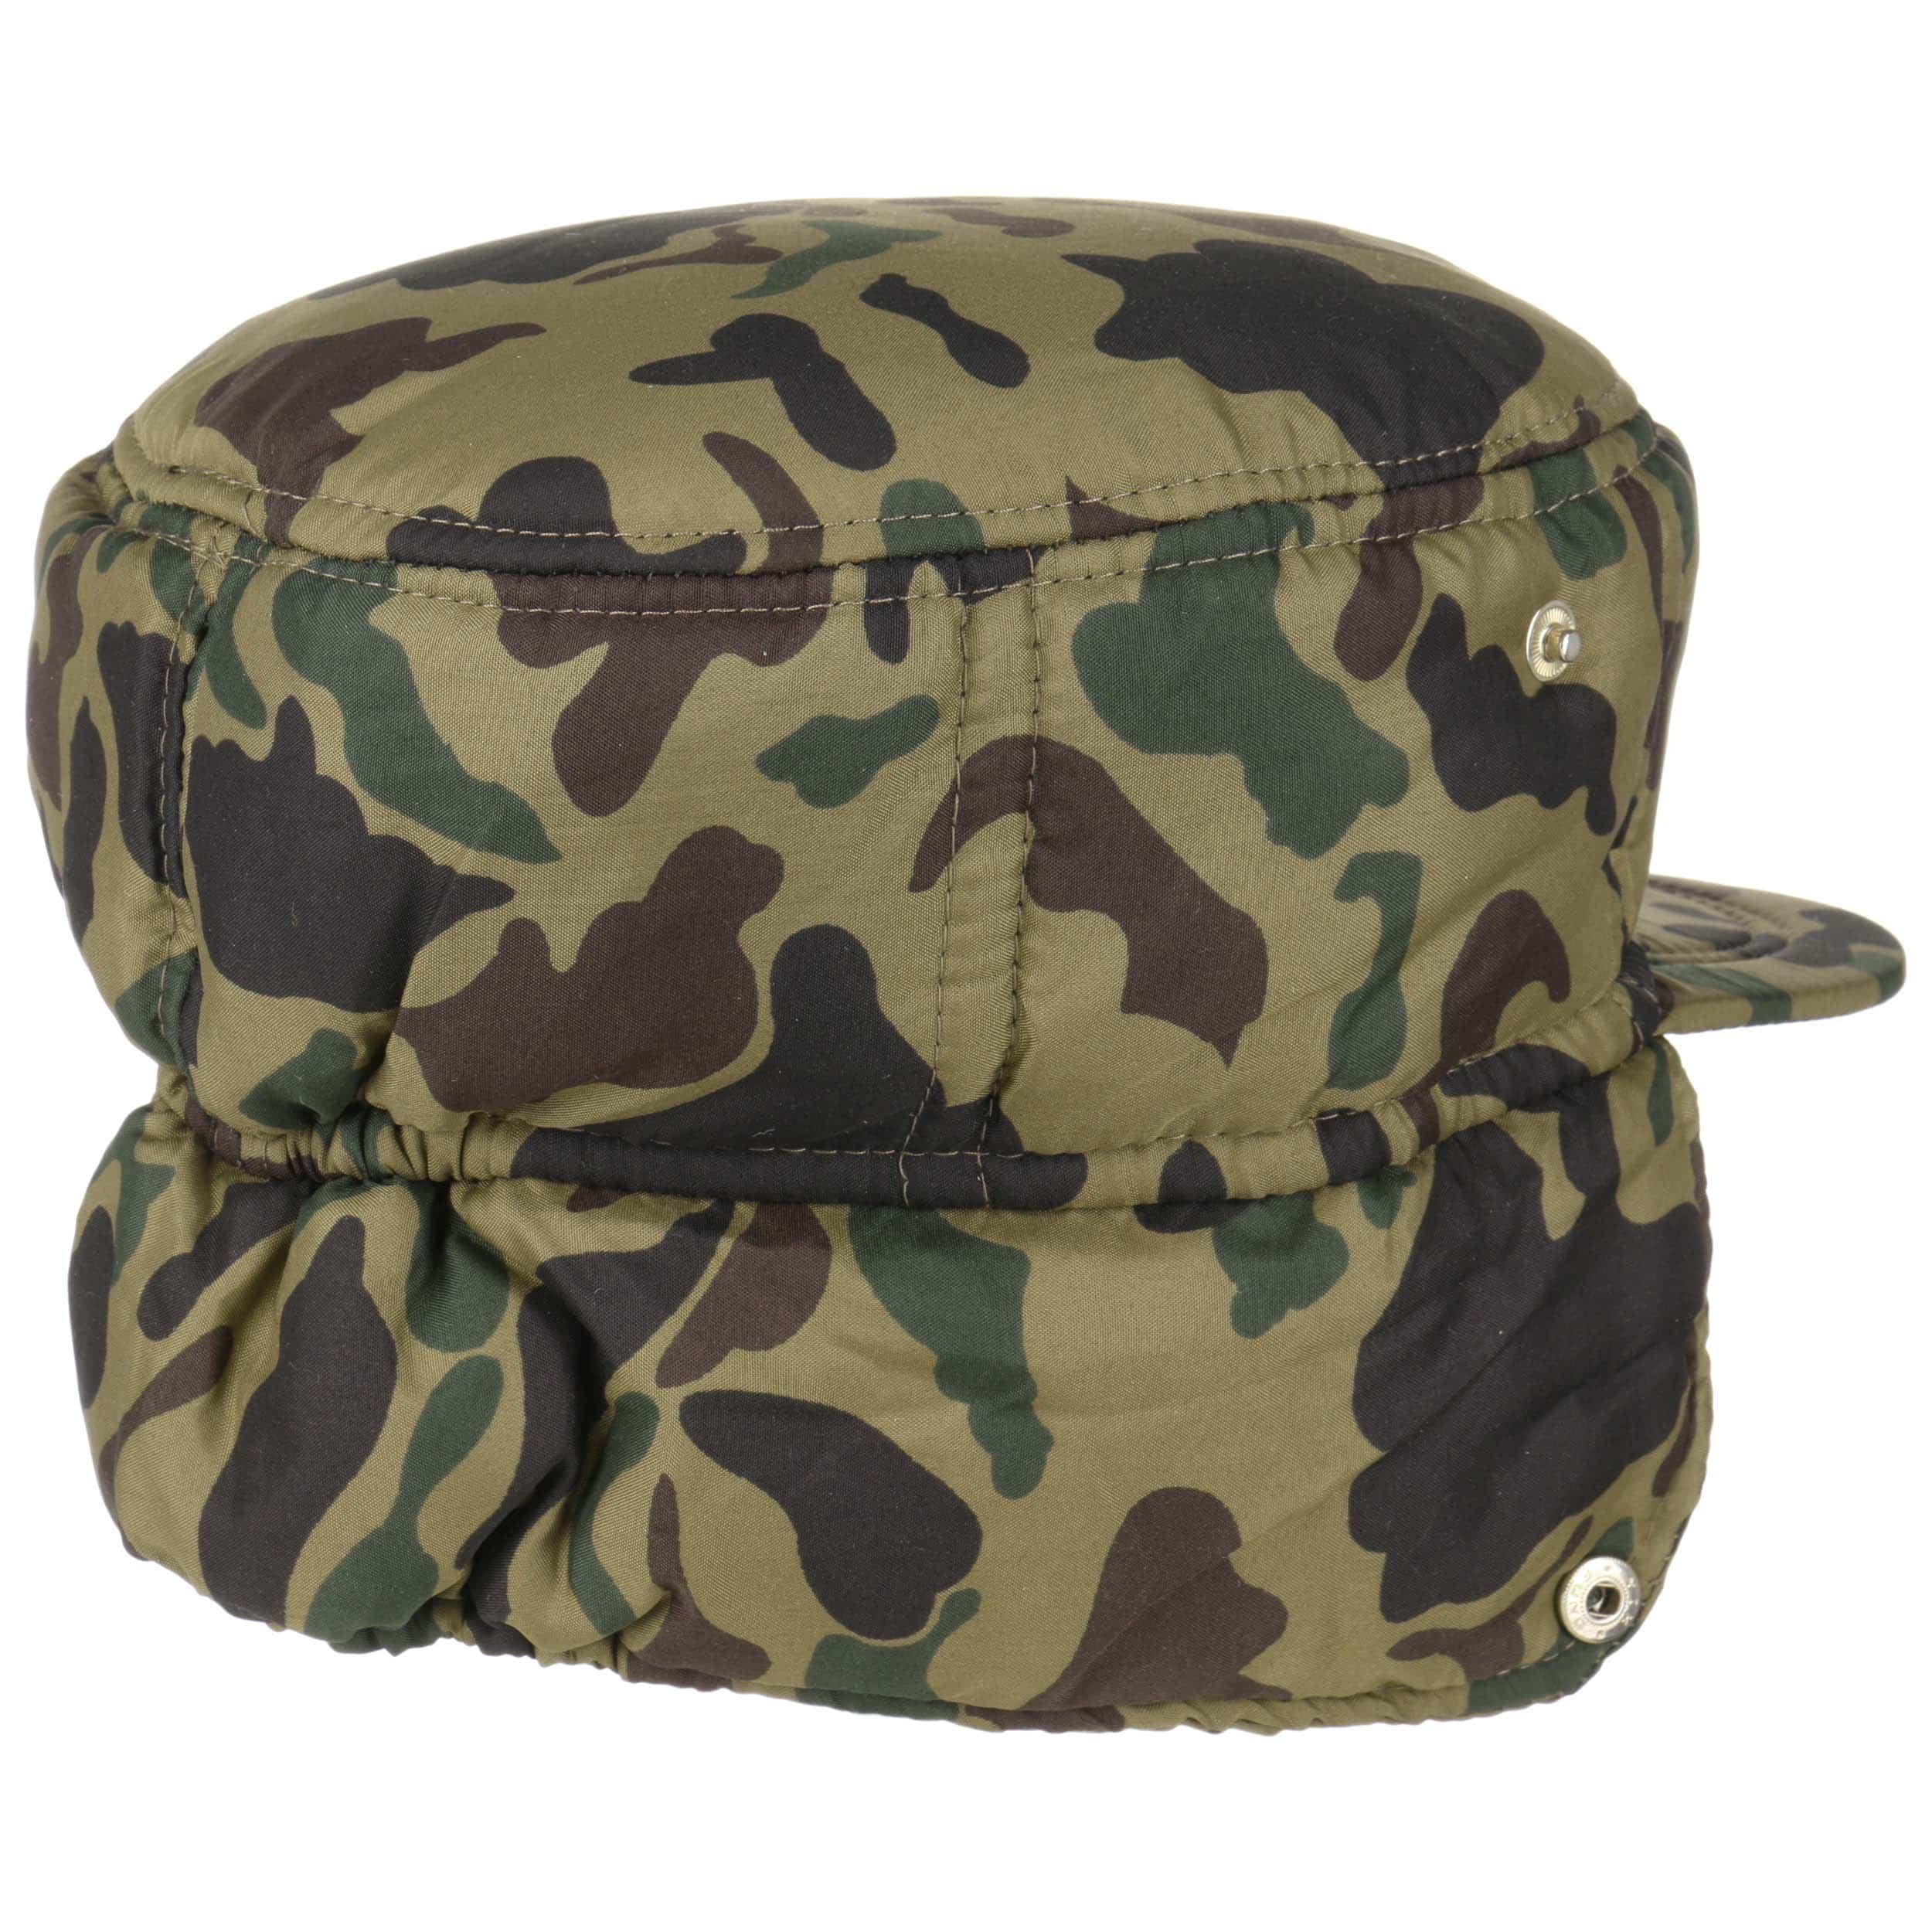 ... Gorra Militar Camouflage con Orejeras by Lipodo - camuflaje 3 ... 62f739dca46